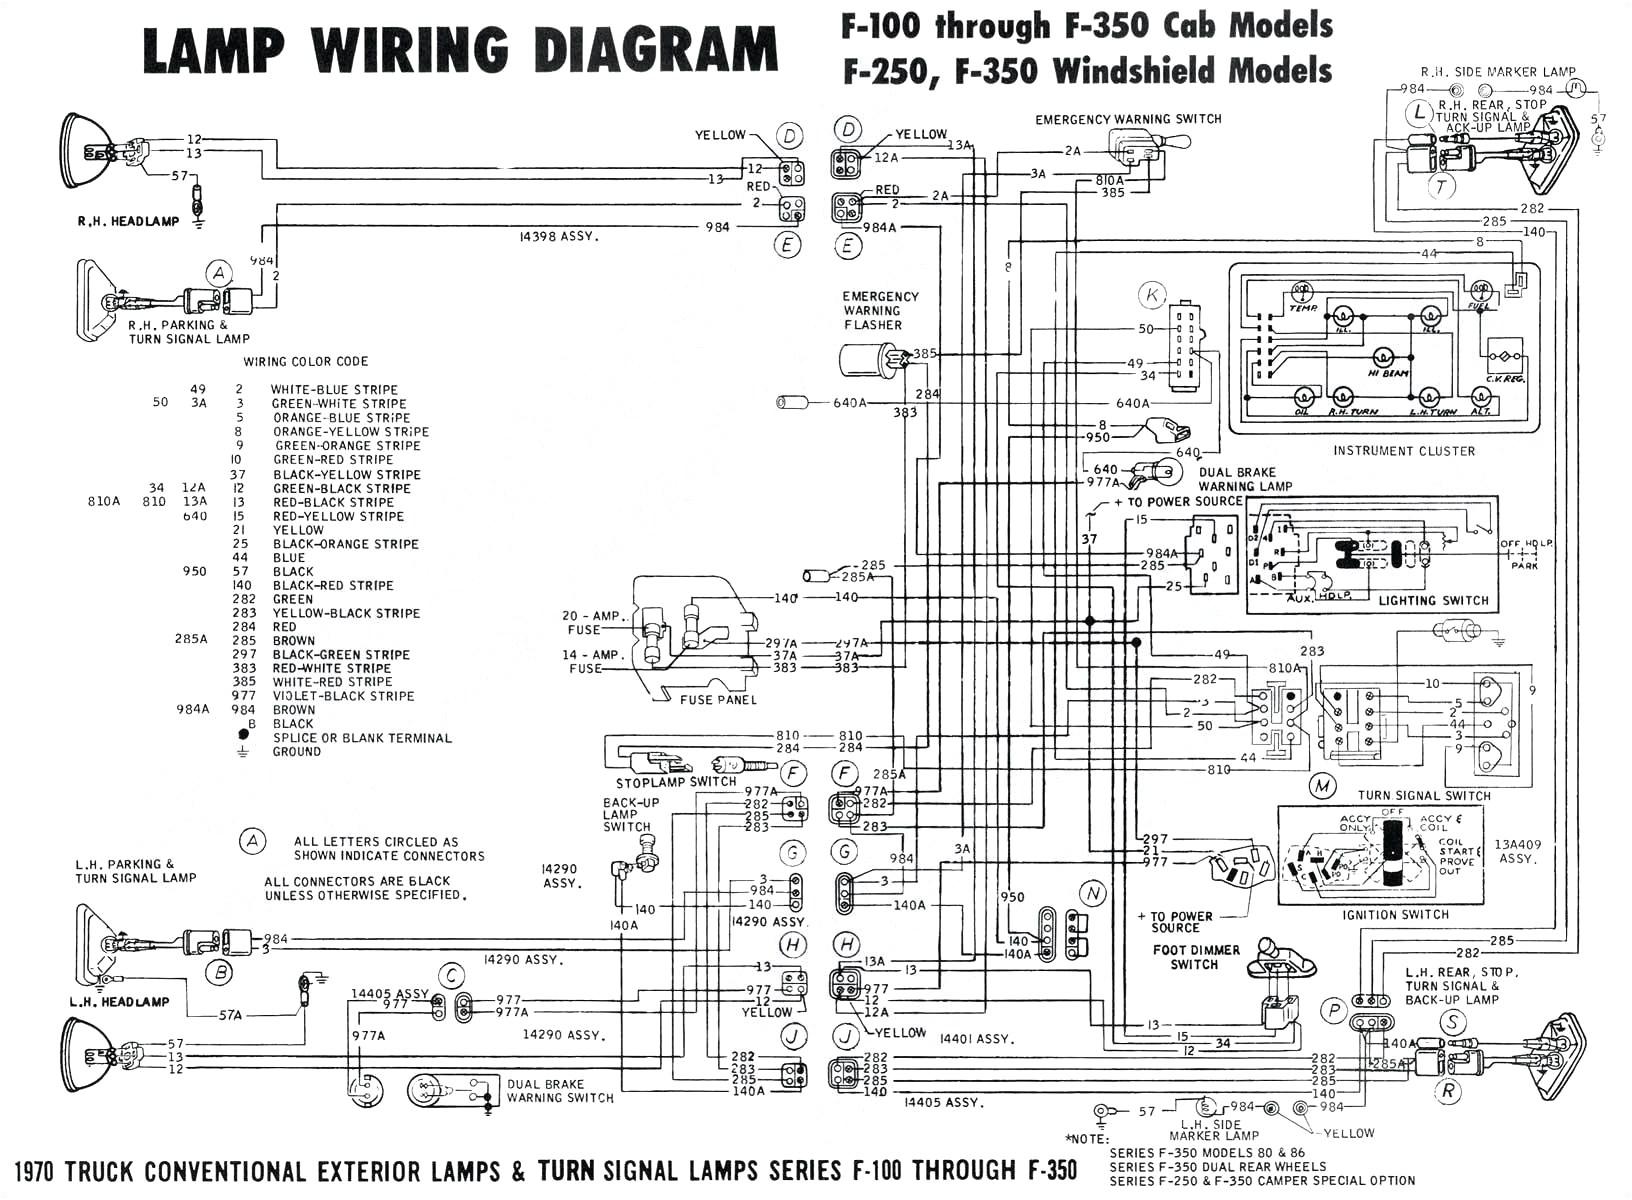 Dolphin Gauges Wiring Diagram Wiring Diagram National Dolphin Wiring Diagram Operations